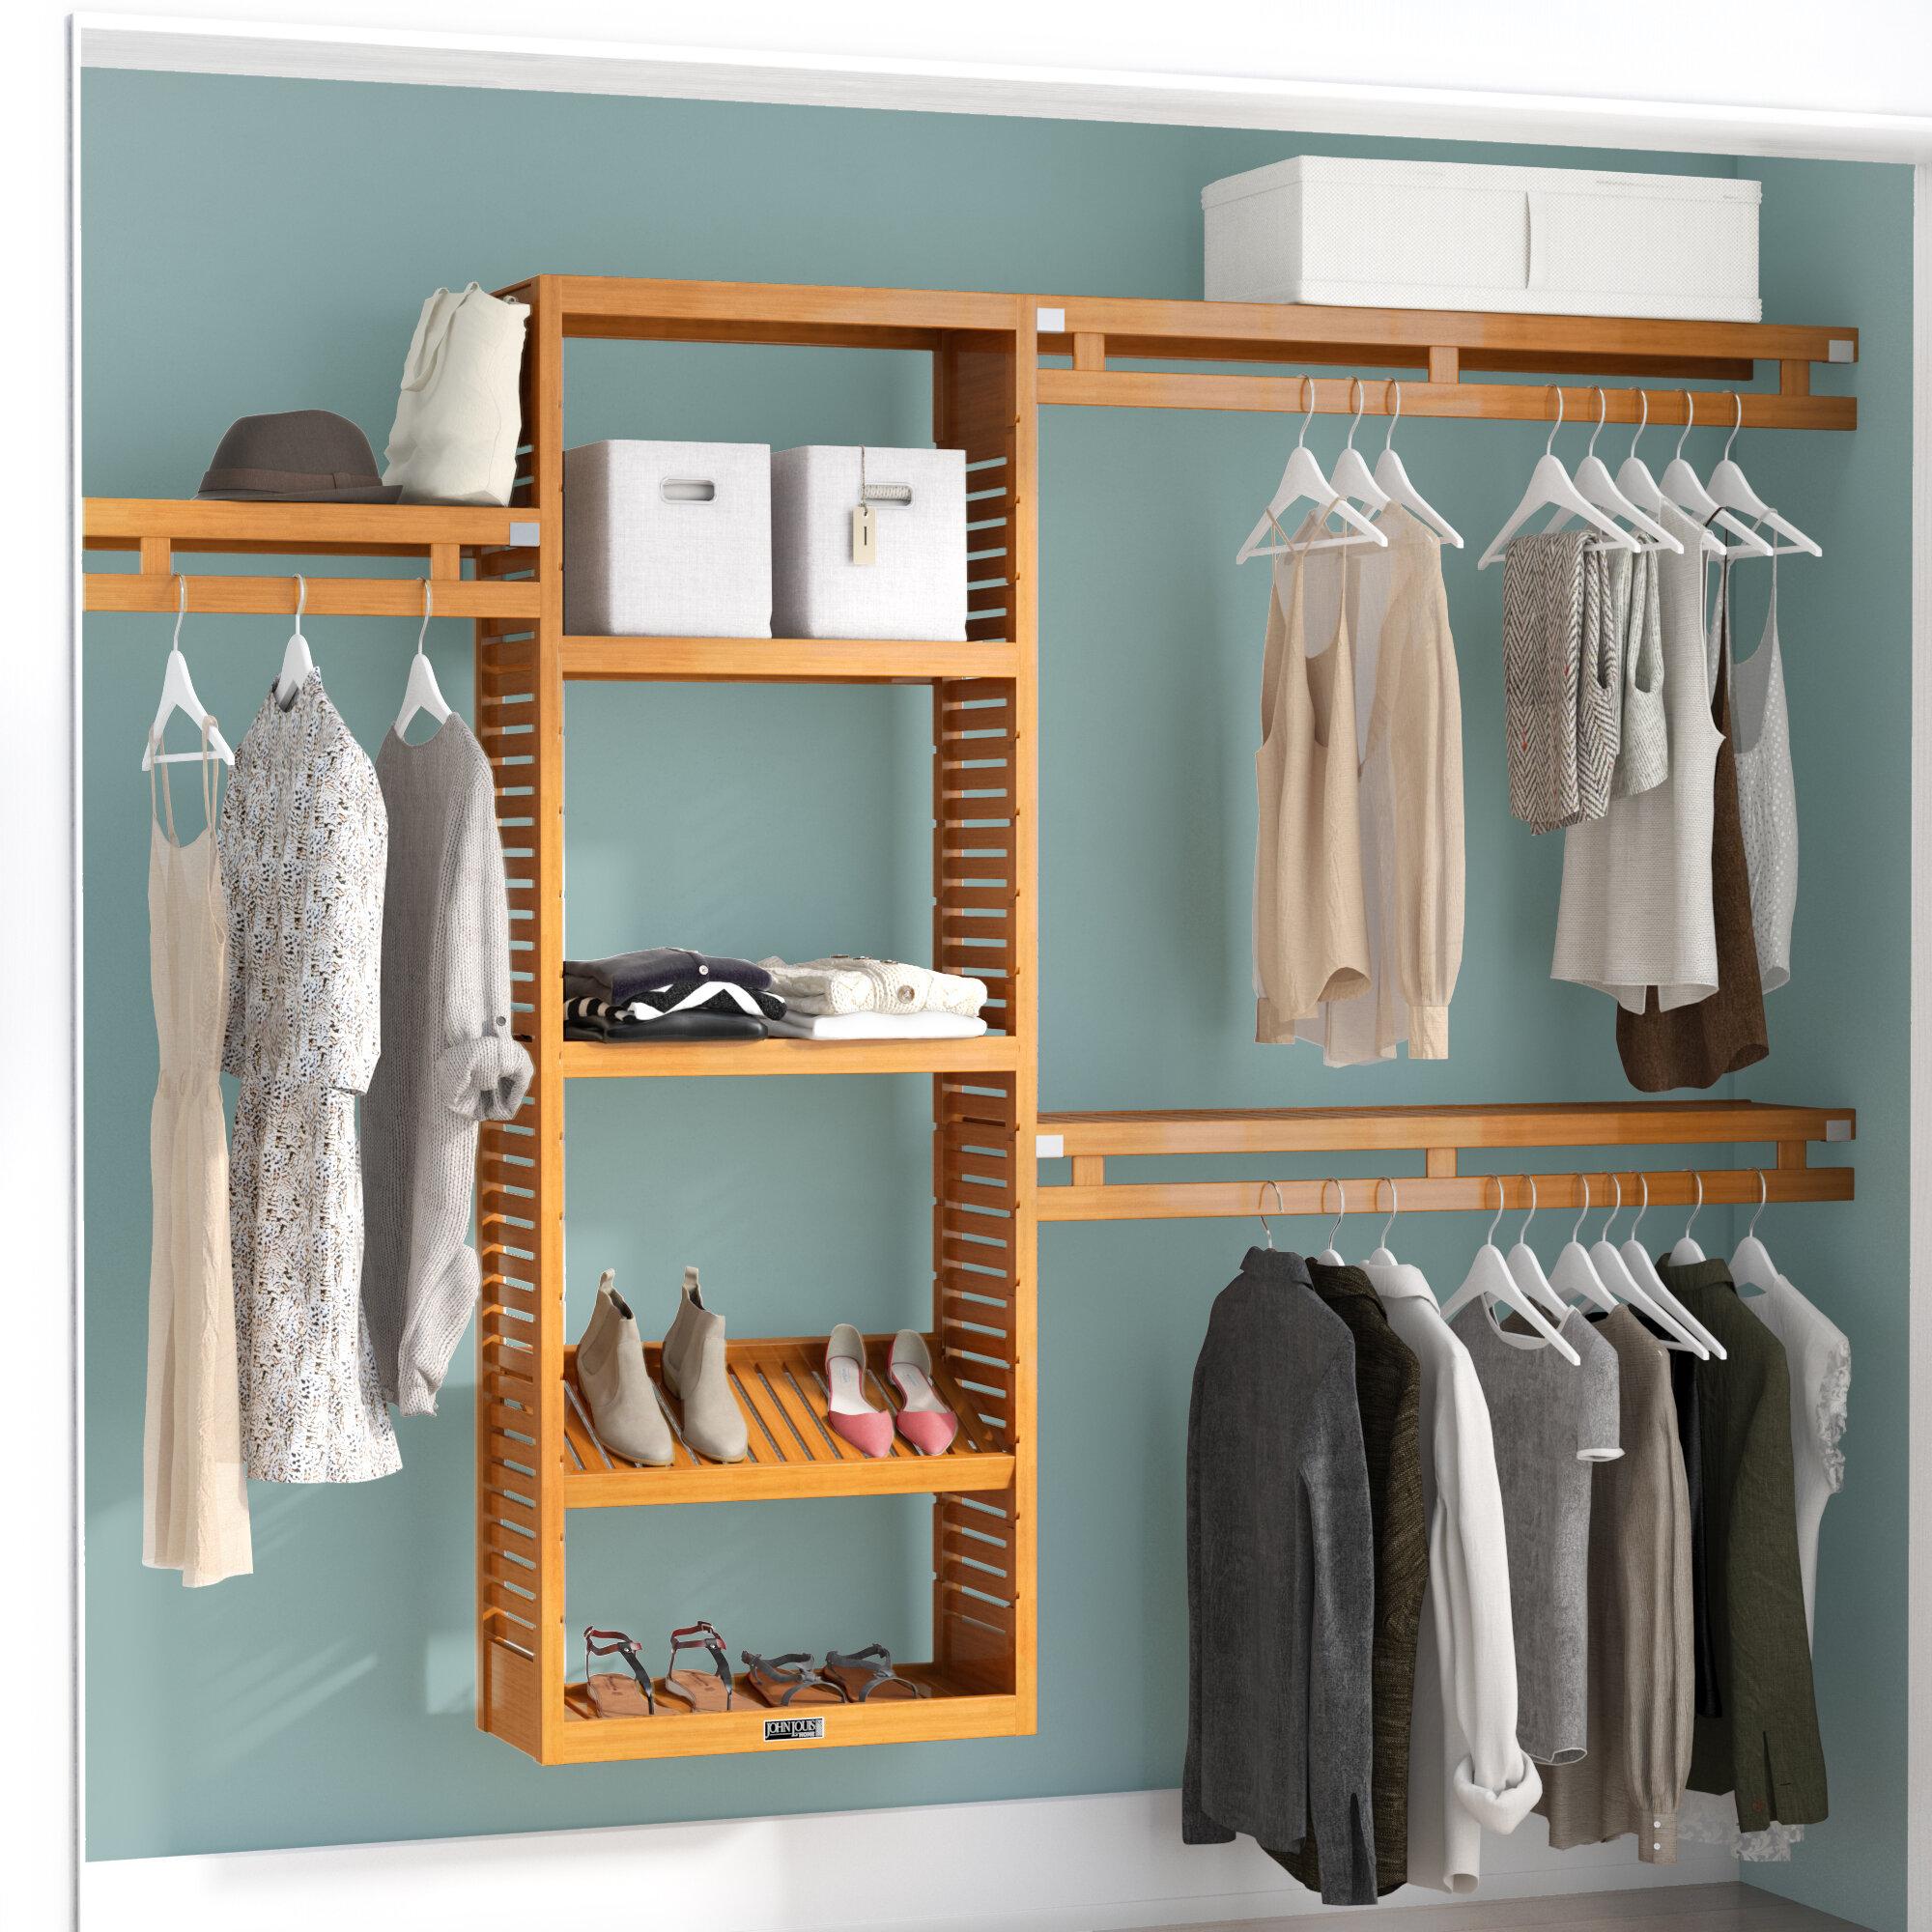 John Louis Home 12 W Deep Solid Wood Simplicity Closet System Reviews Wayfair